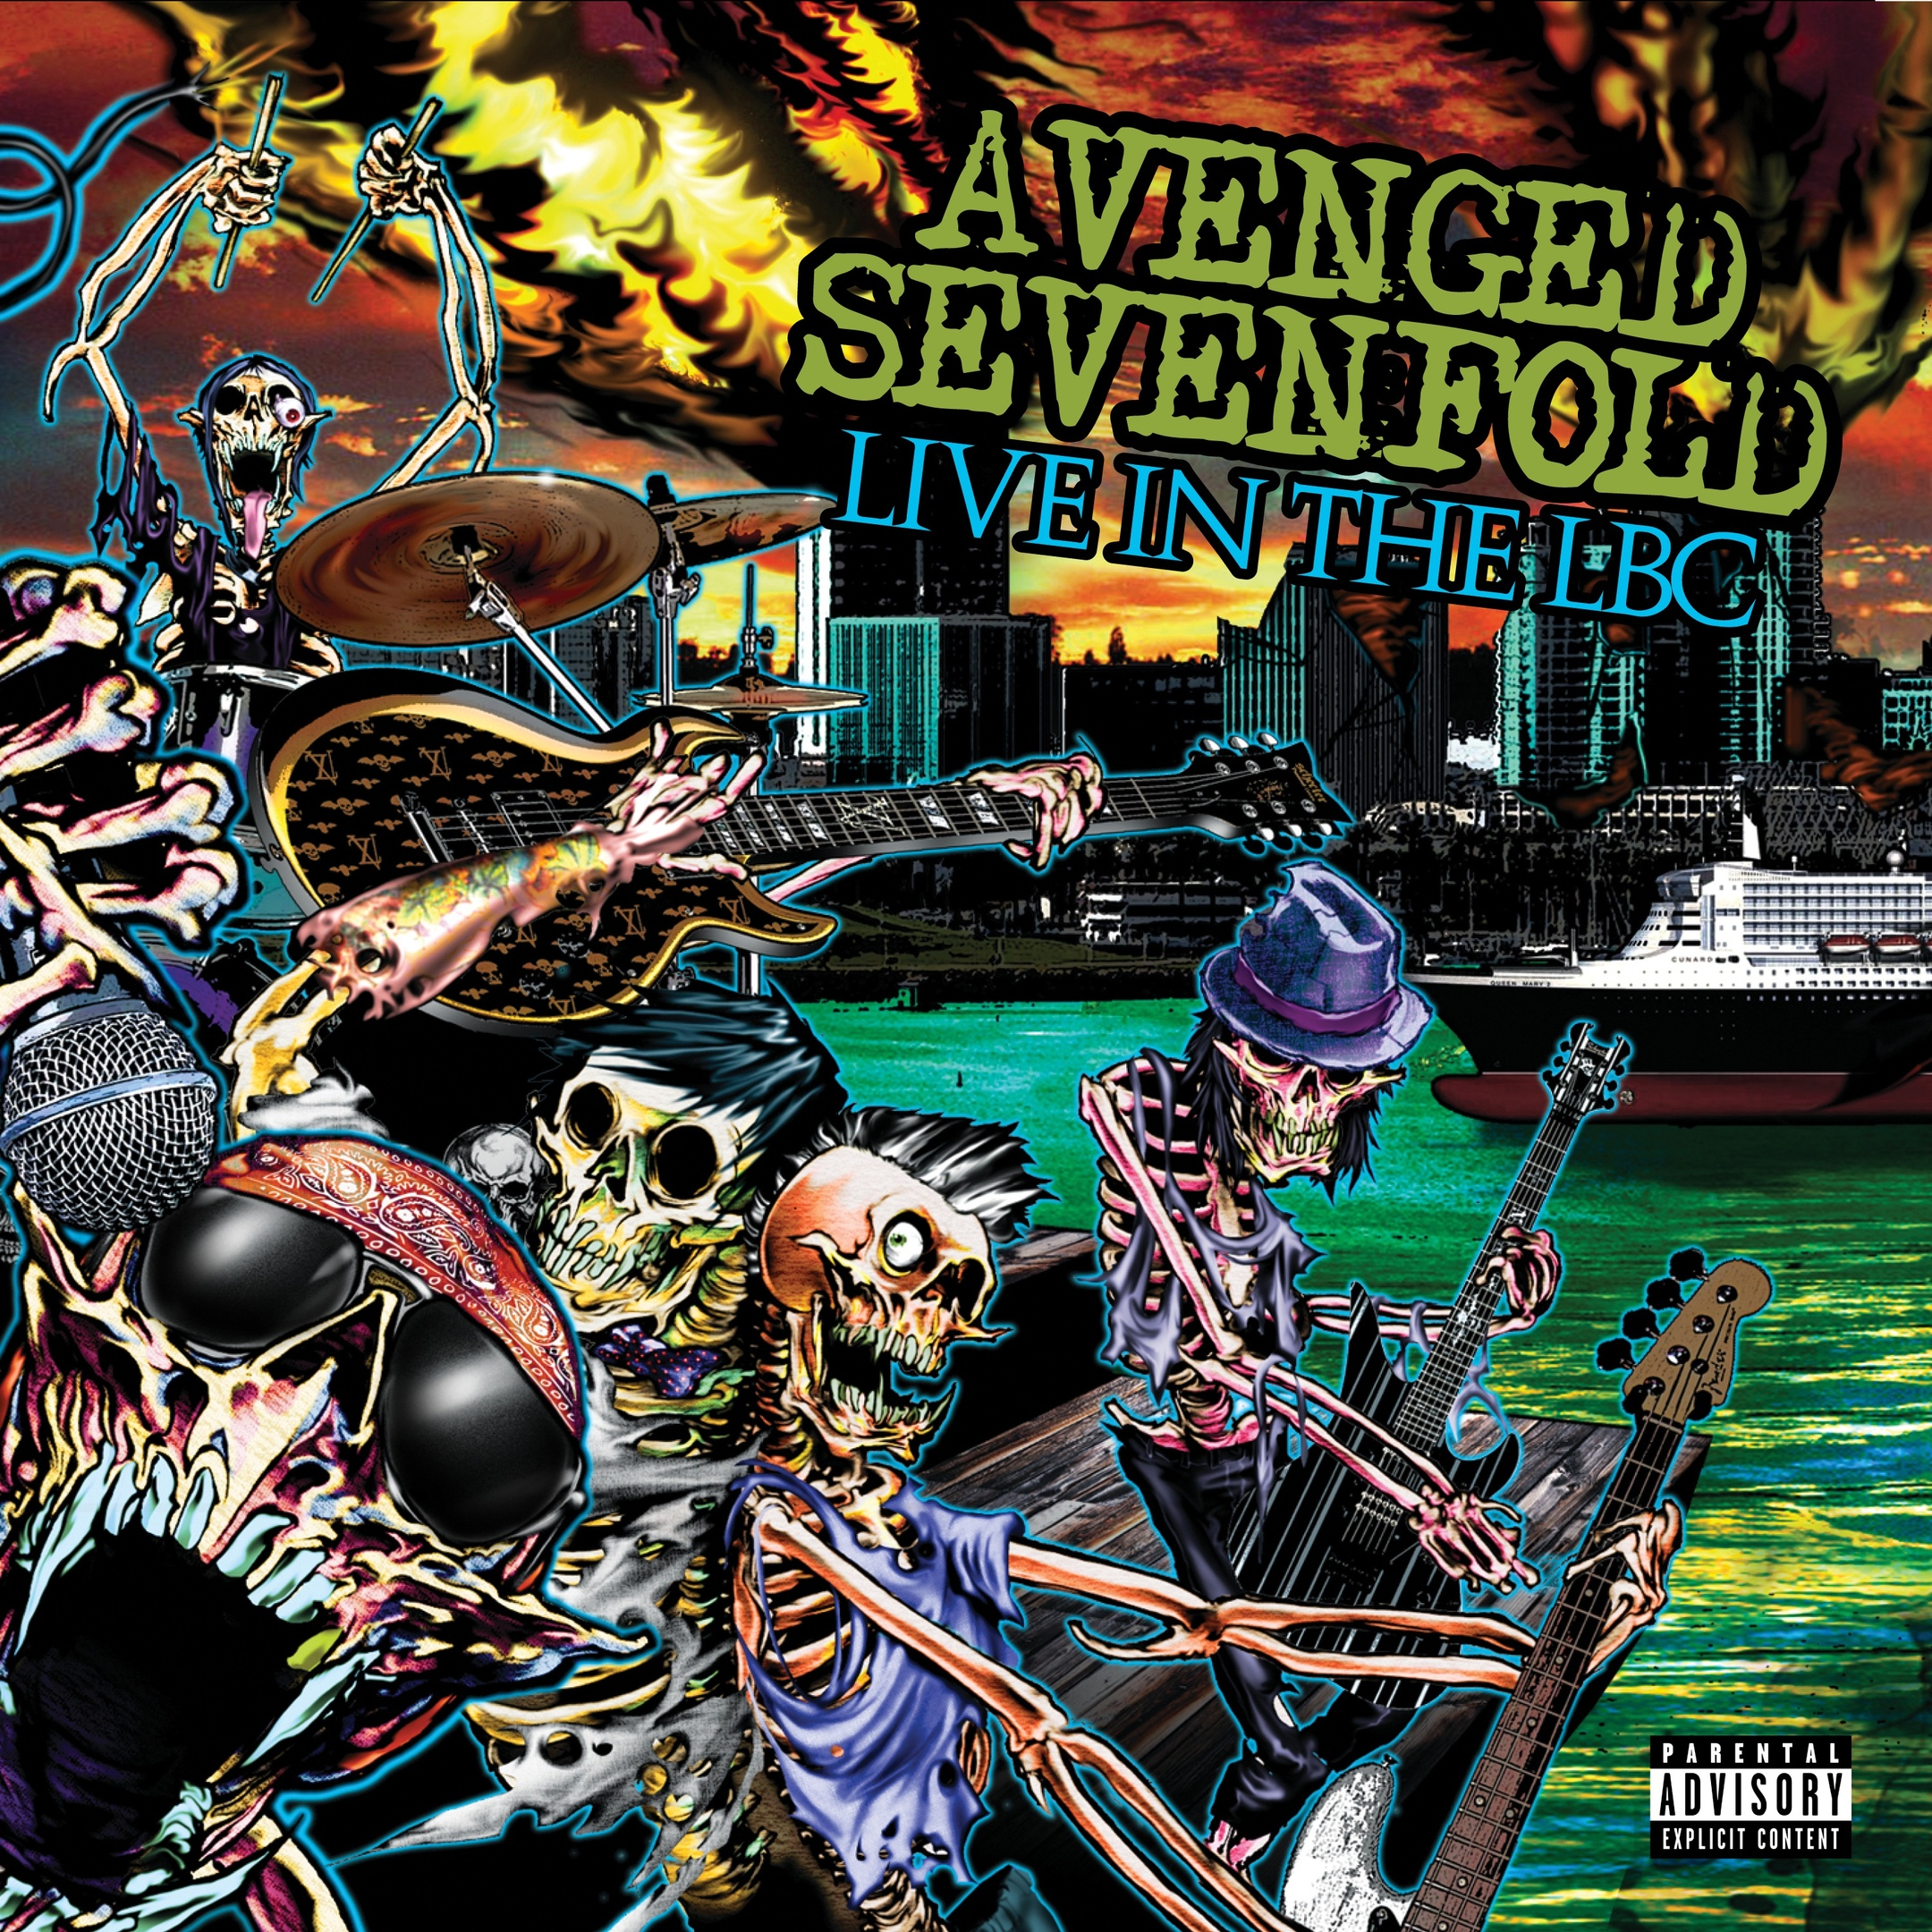 Avenged Sevenfold album Live in the LBC